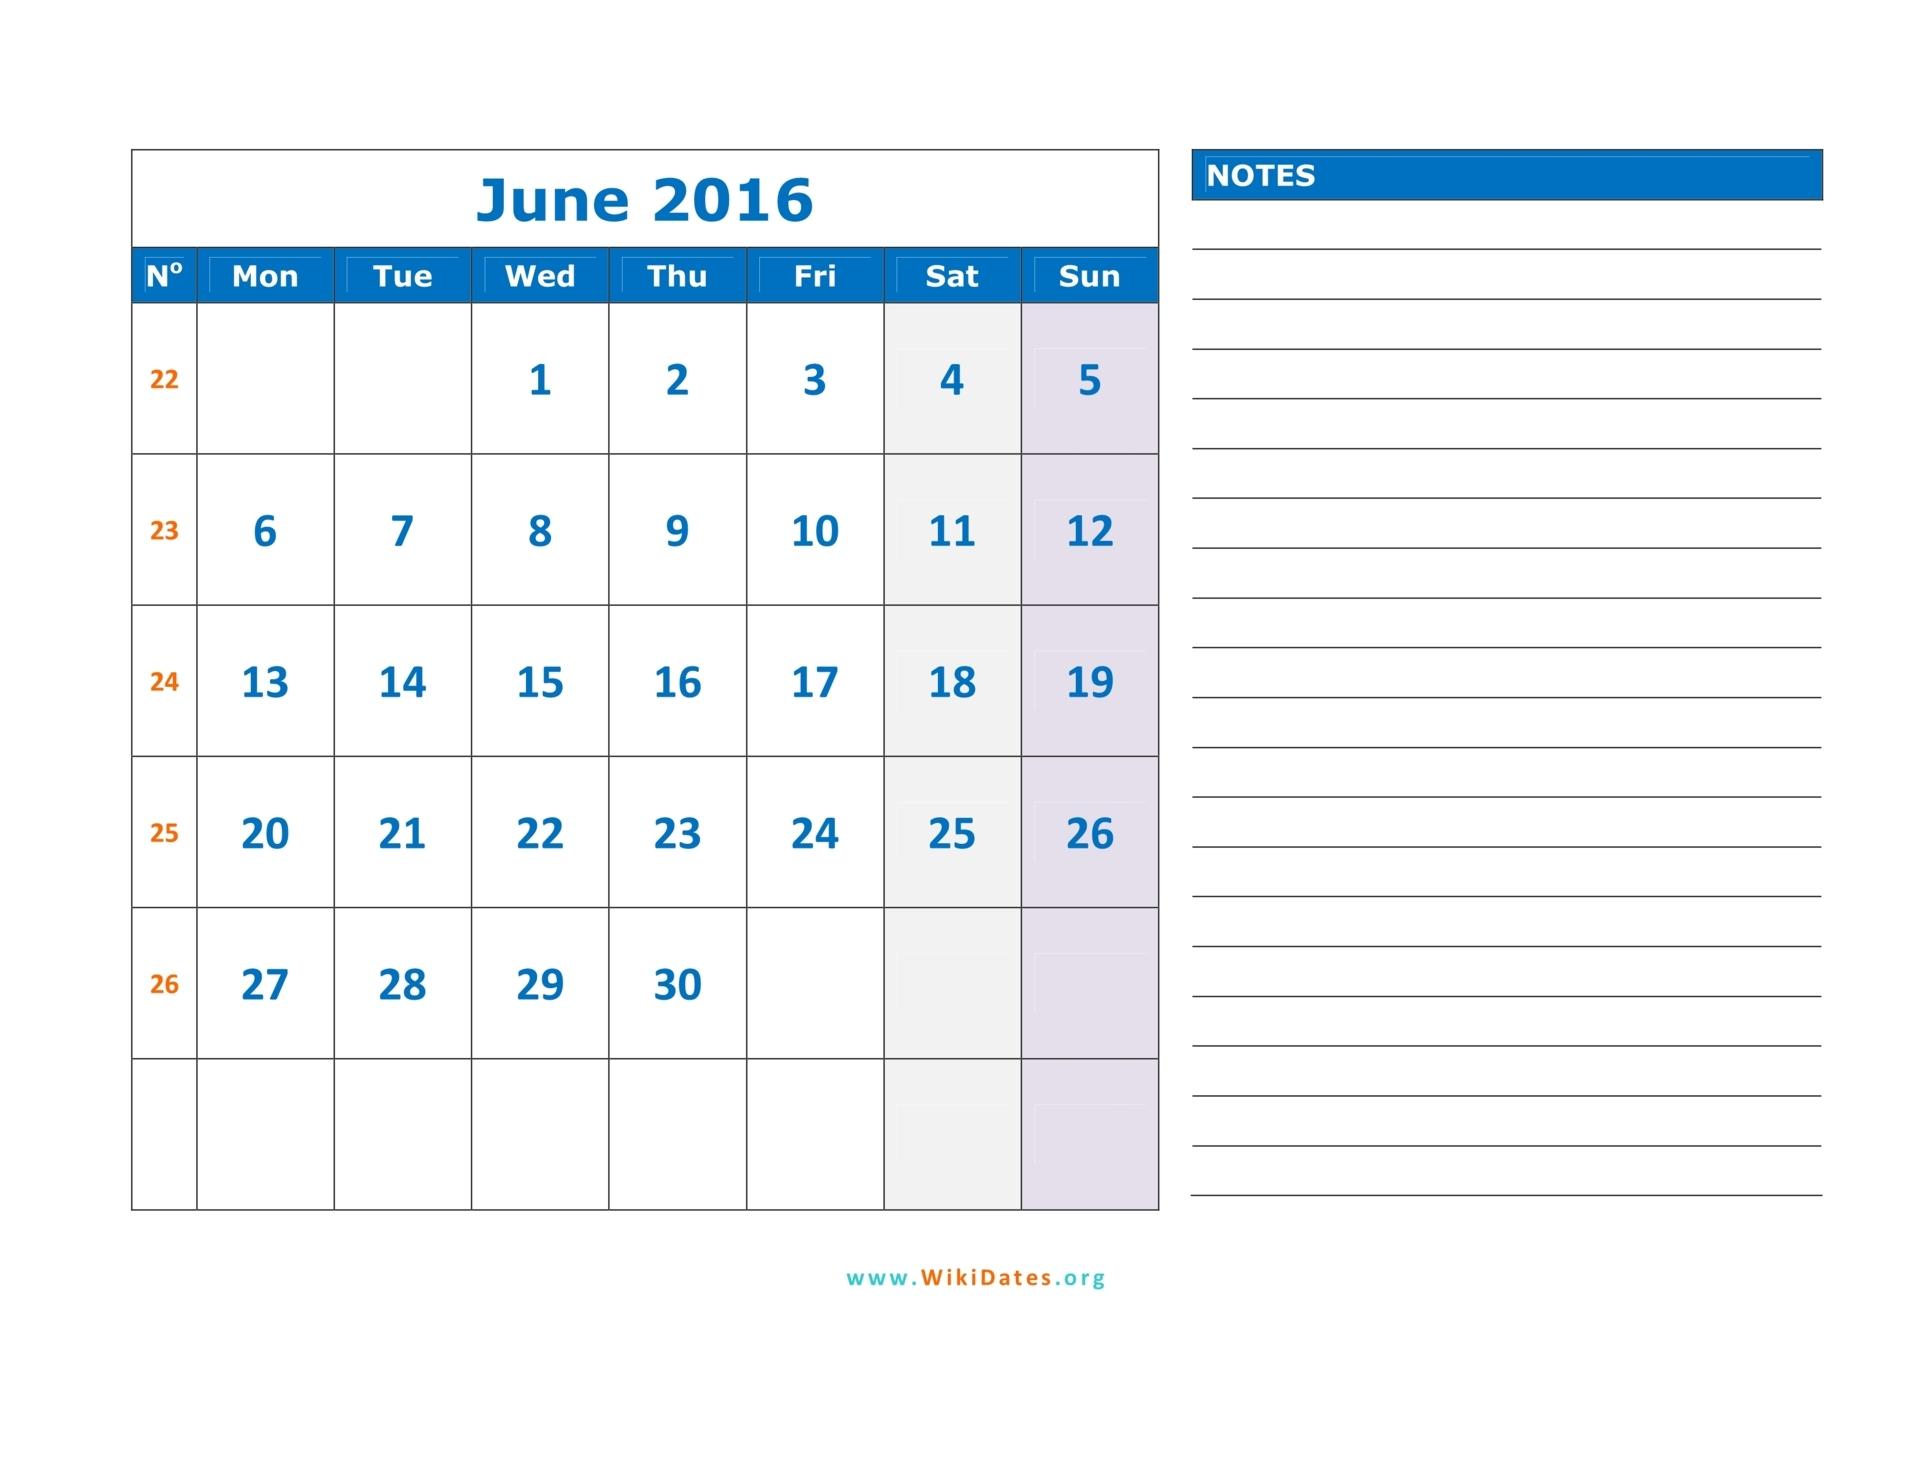 June 2016 Calendar | WikiDates.org